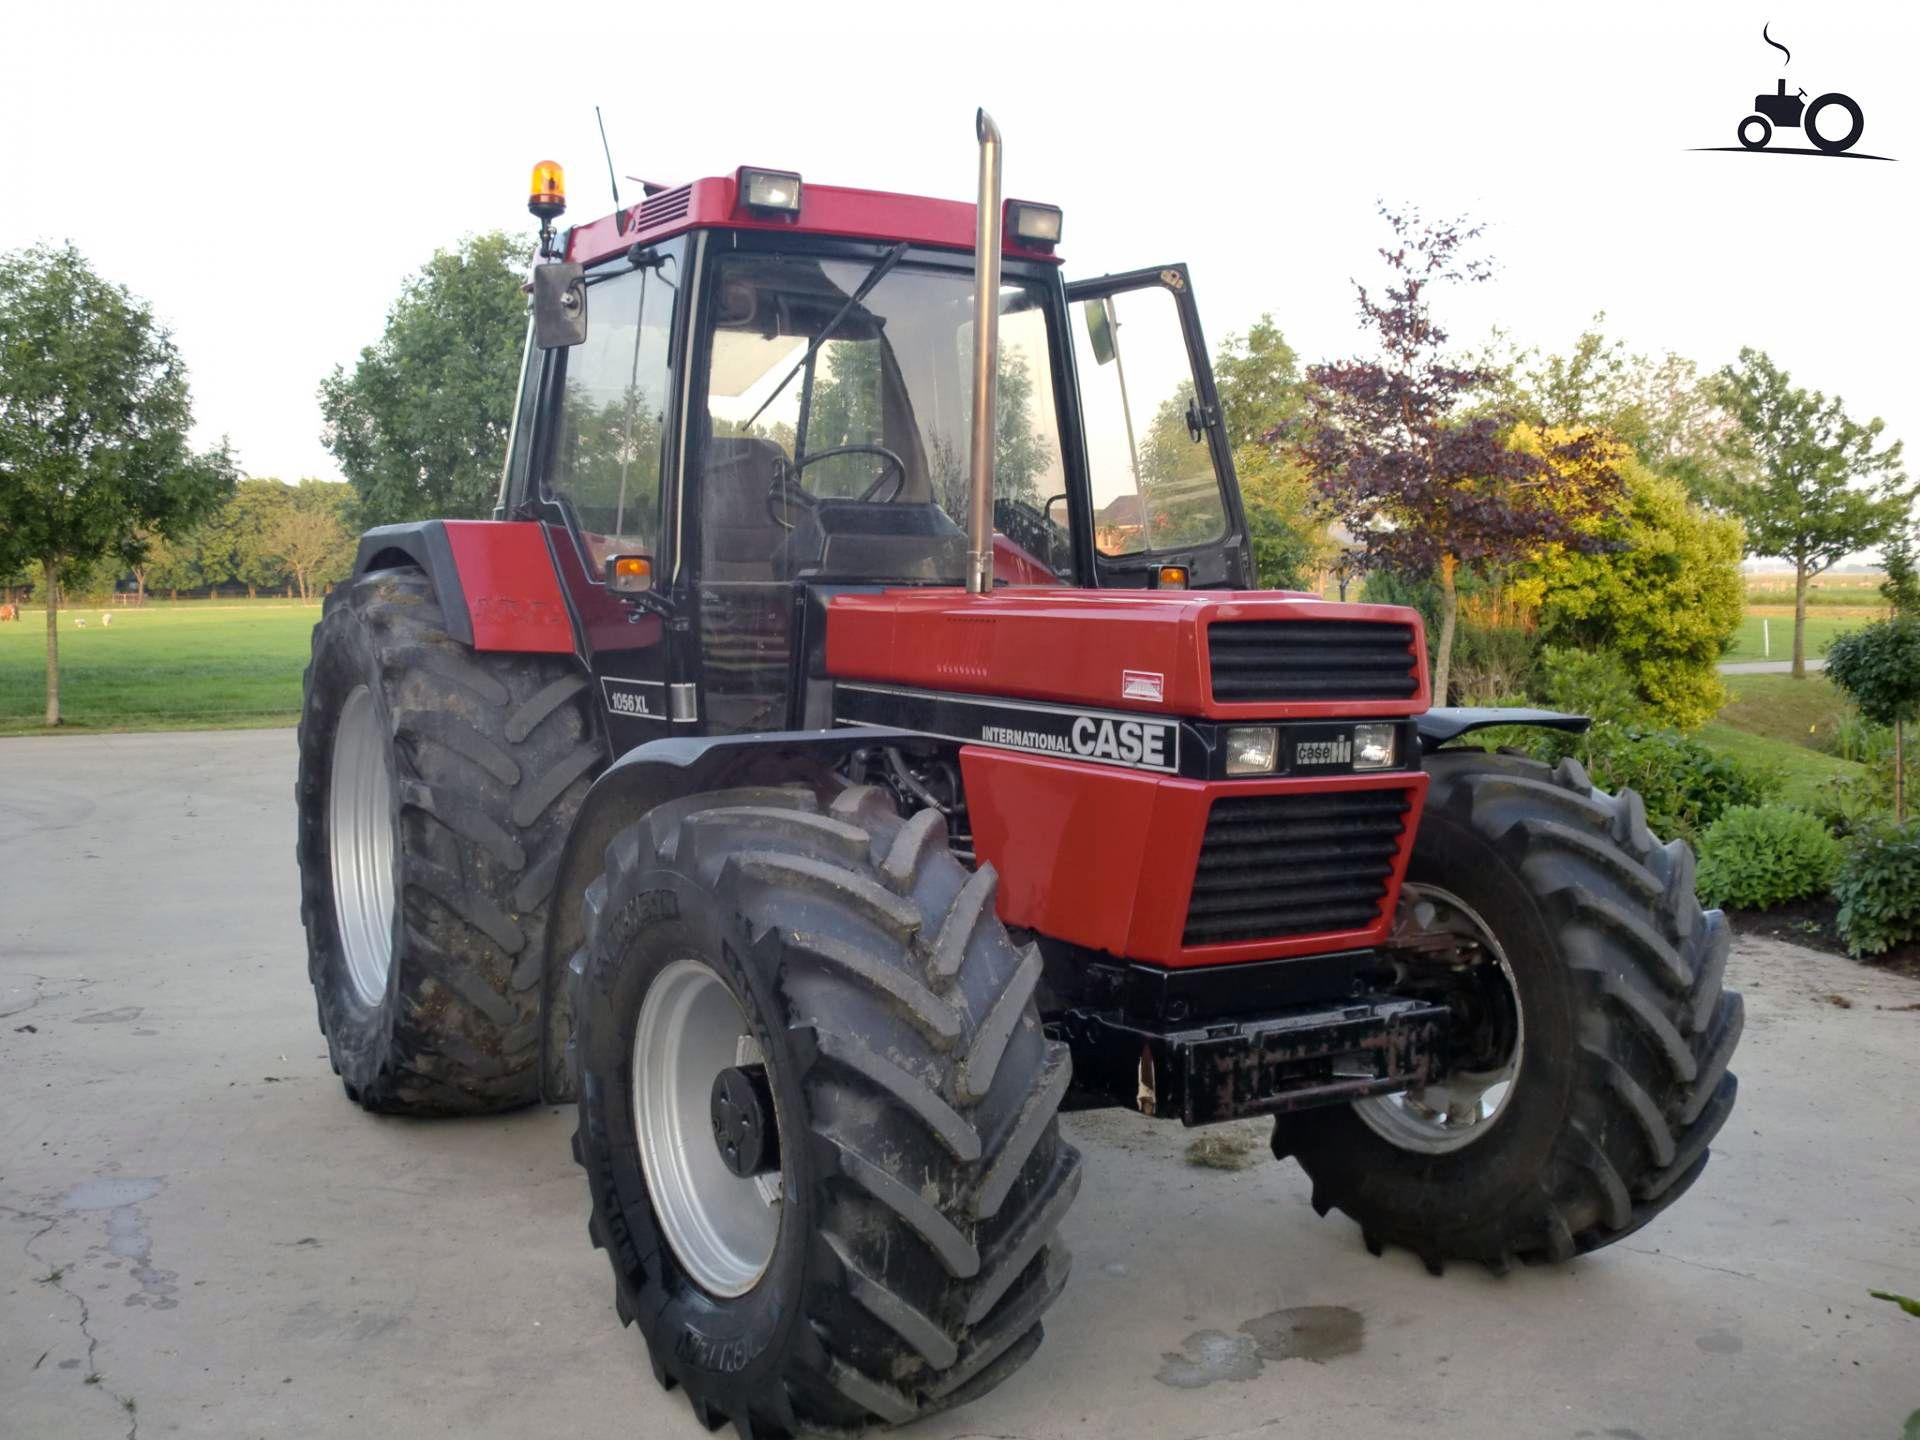 International Case 885xl Super Two Traktoren Traktor